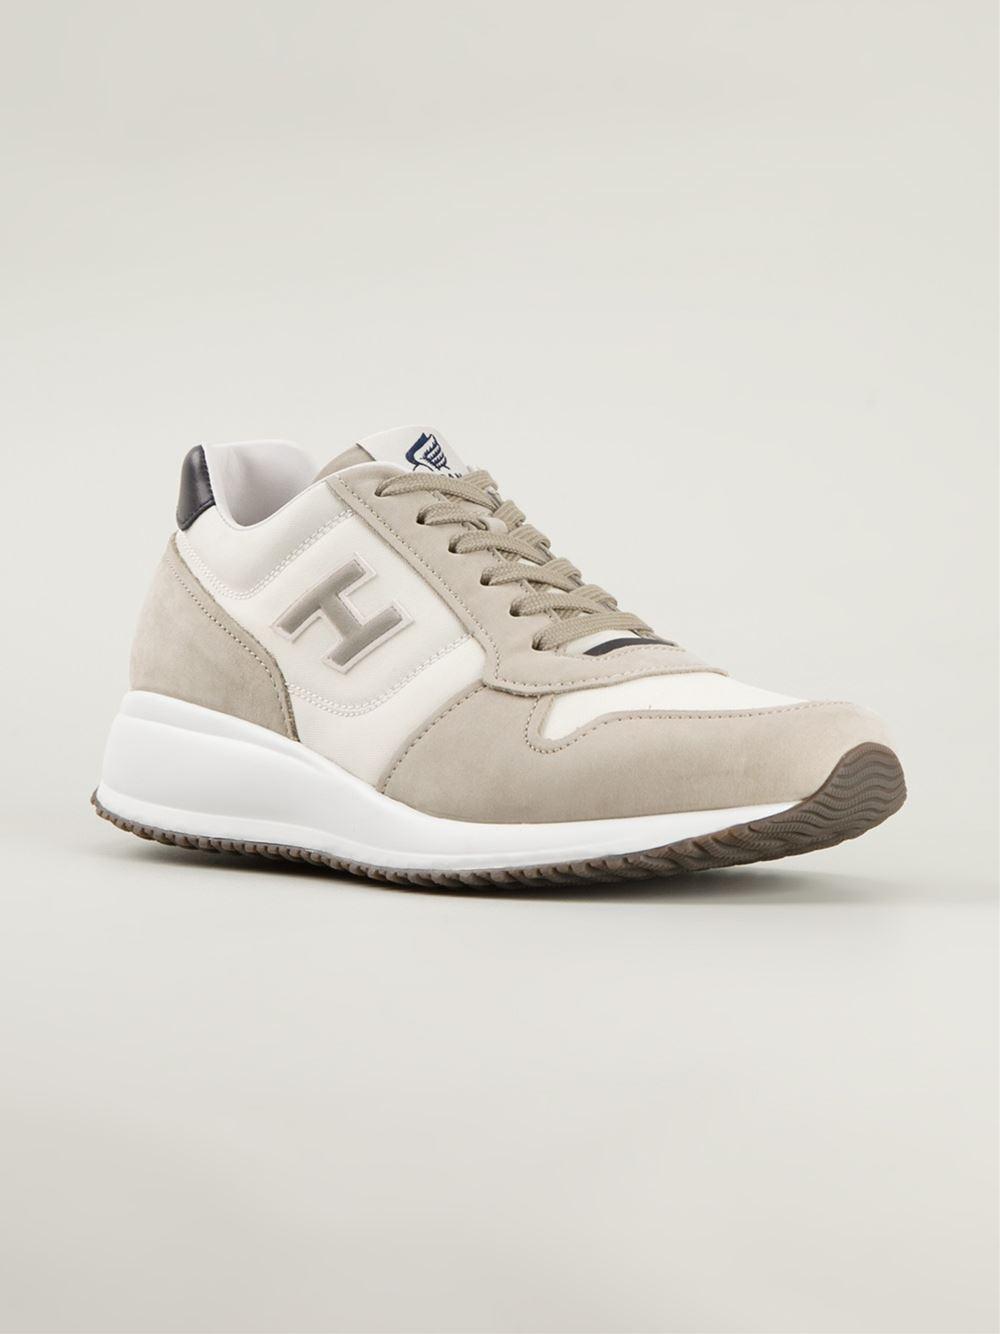 Hogan 'Interactive N20' Sneakers in Natural for Men - Lyst